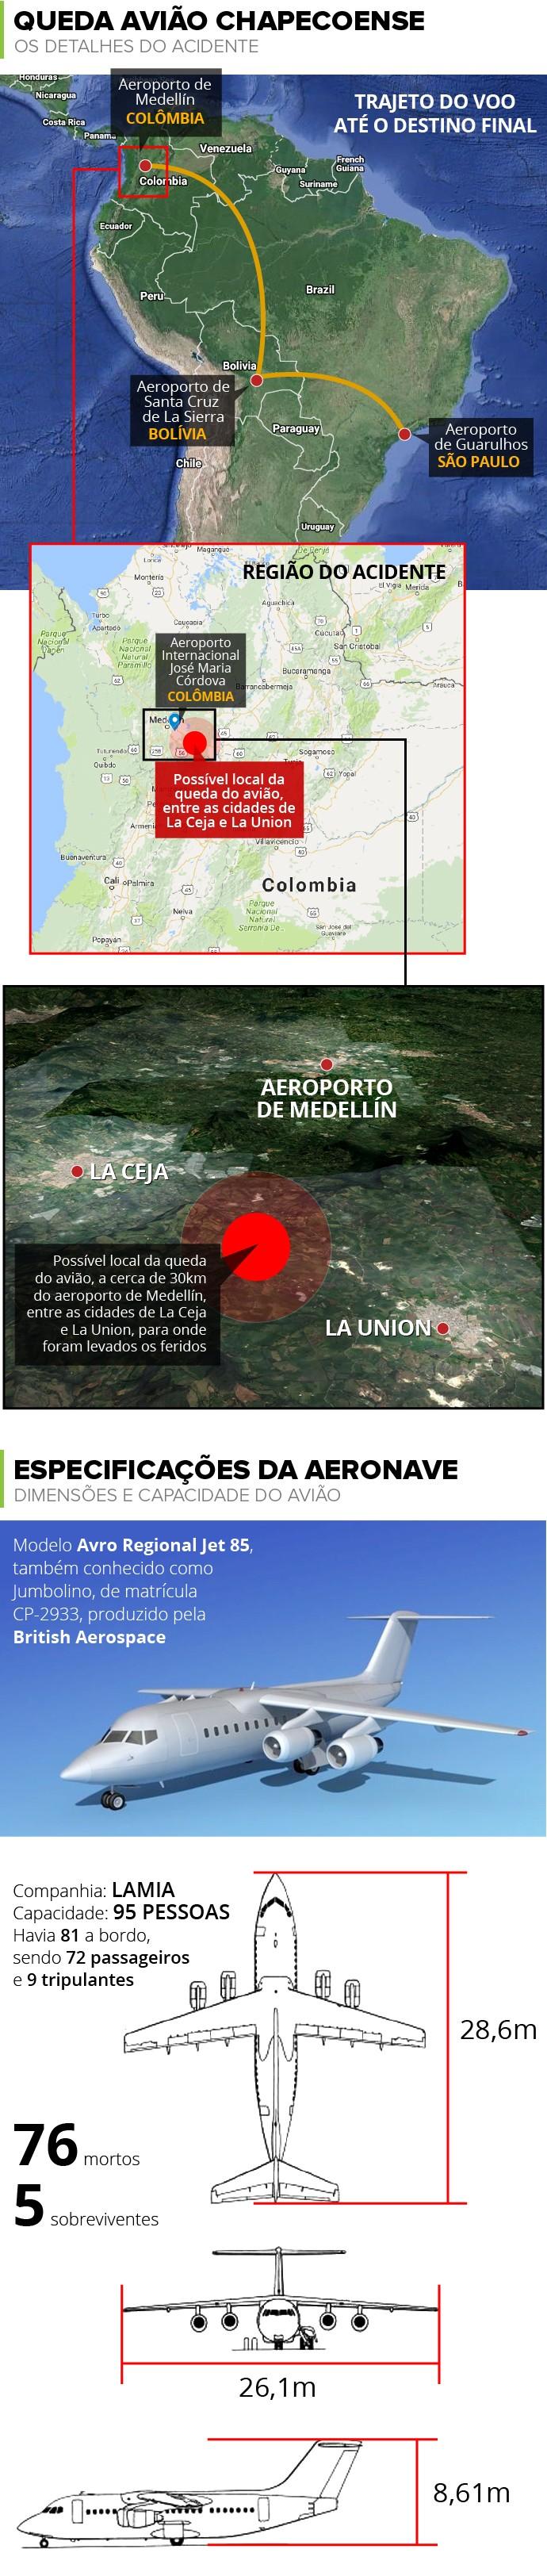 Info QUEDA AVIAO Chapecoense D (Foto: infoesporte)